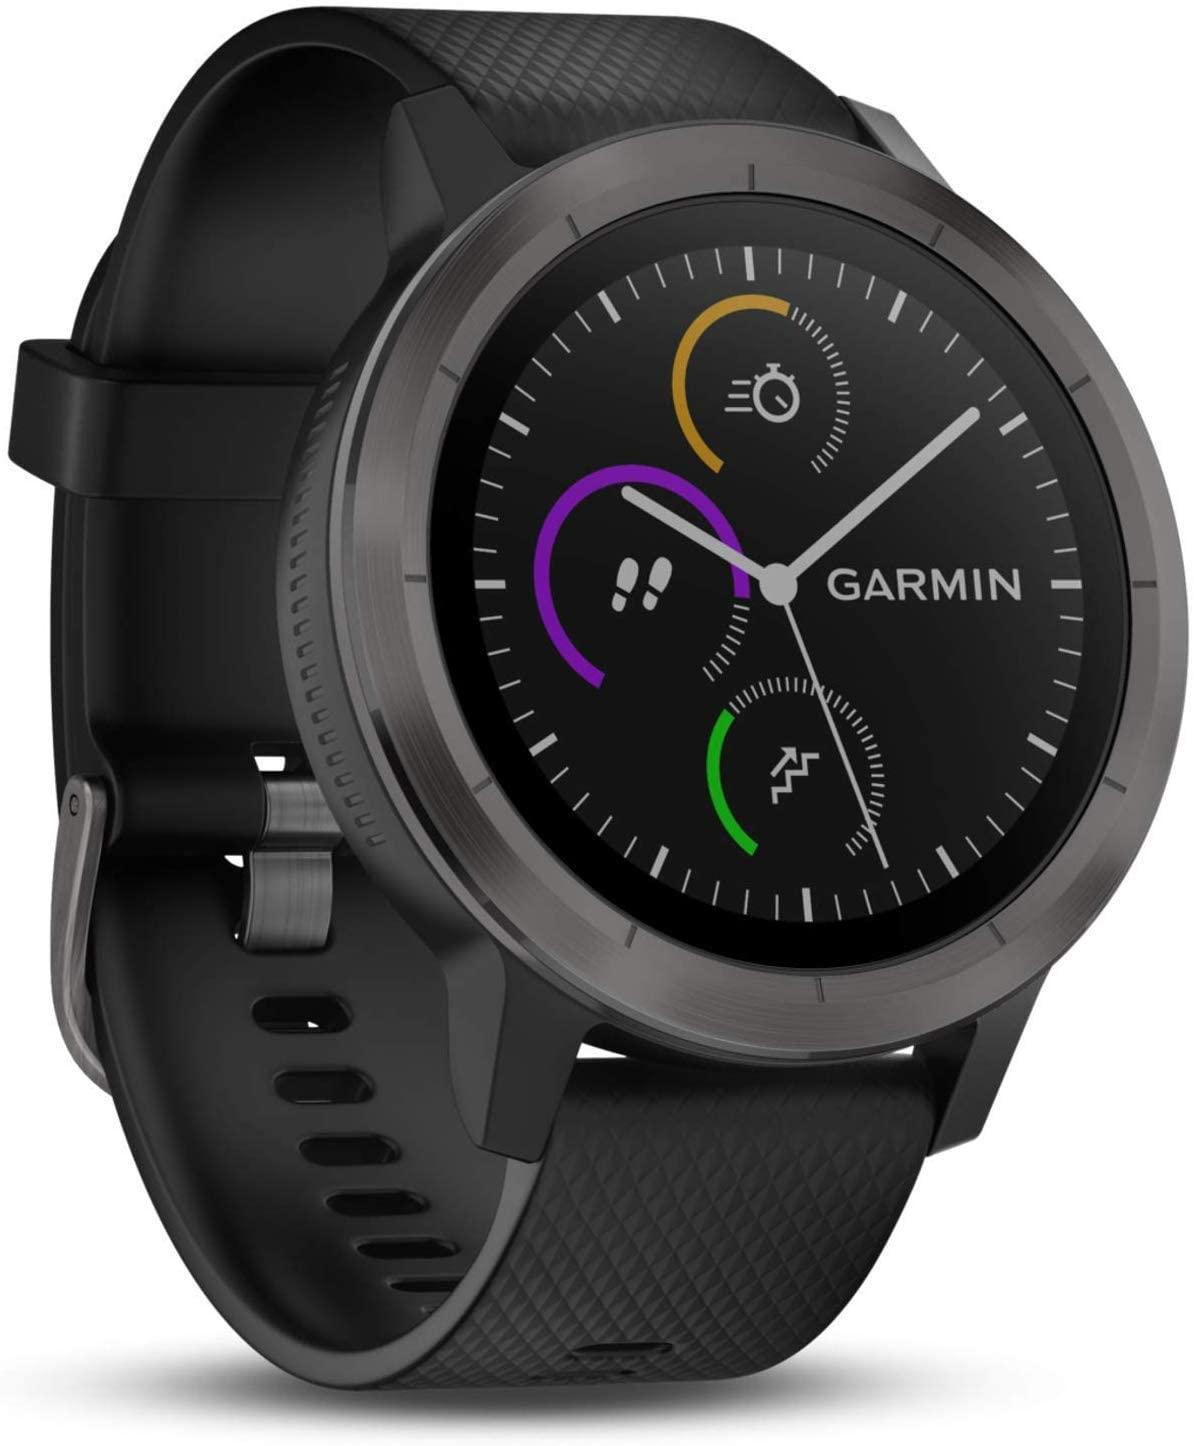 Montre connectée Garmin vivoactive 3